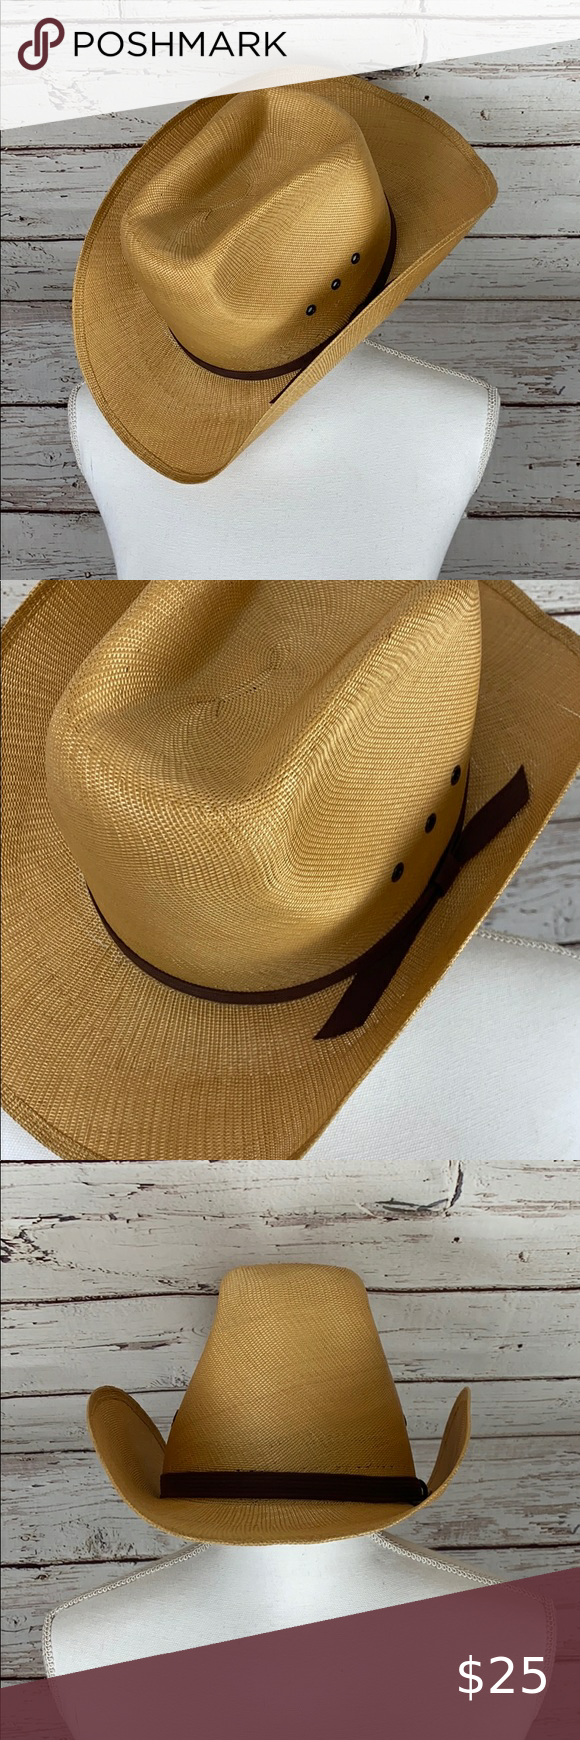 Star Line Loredo Texas Cowboy Hat Vintage Hats Vintage Cowboy Hats Flex Fit Hats